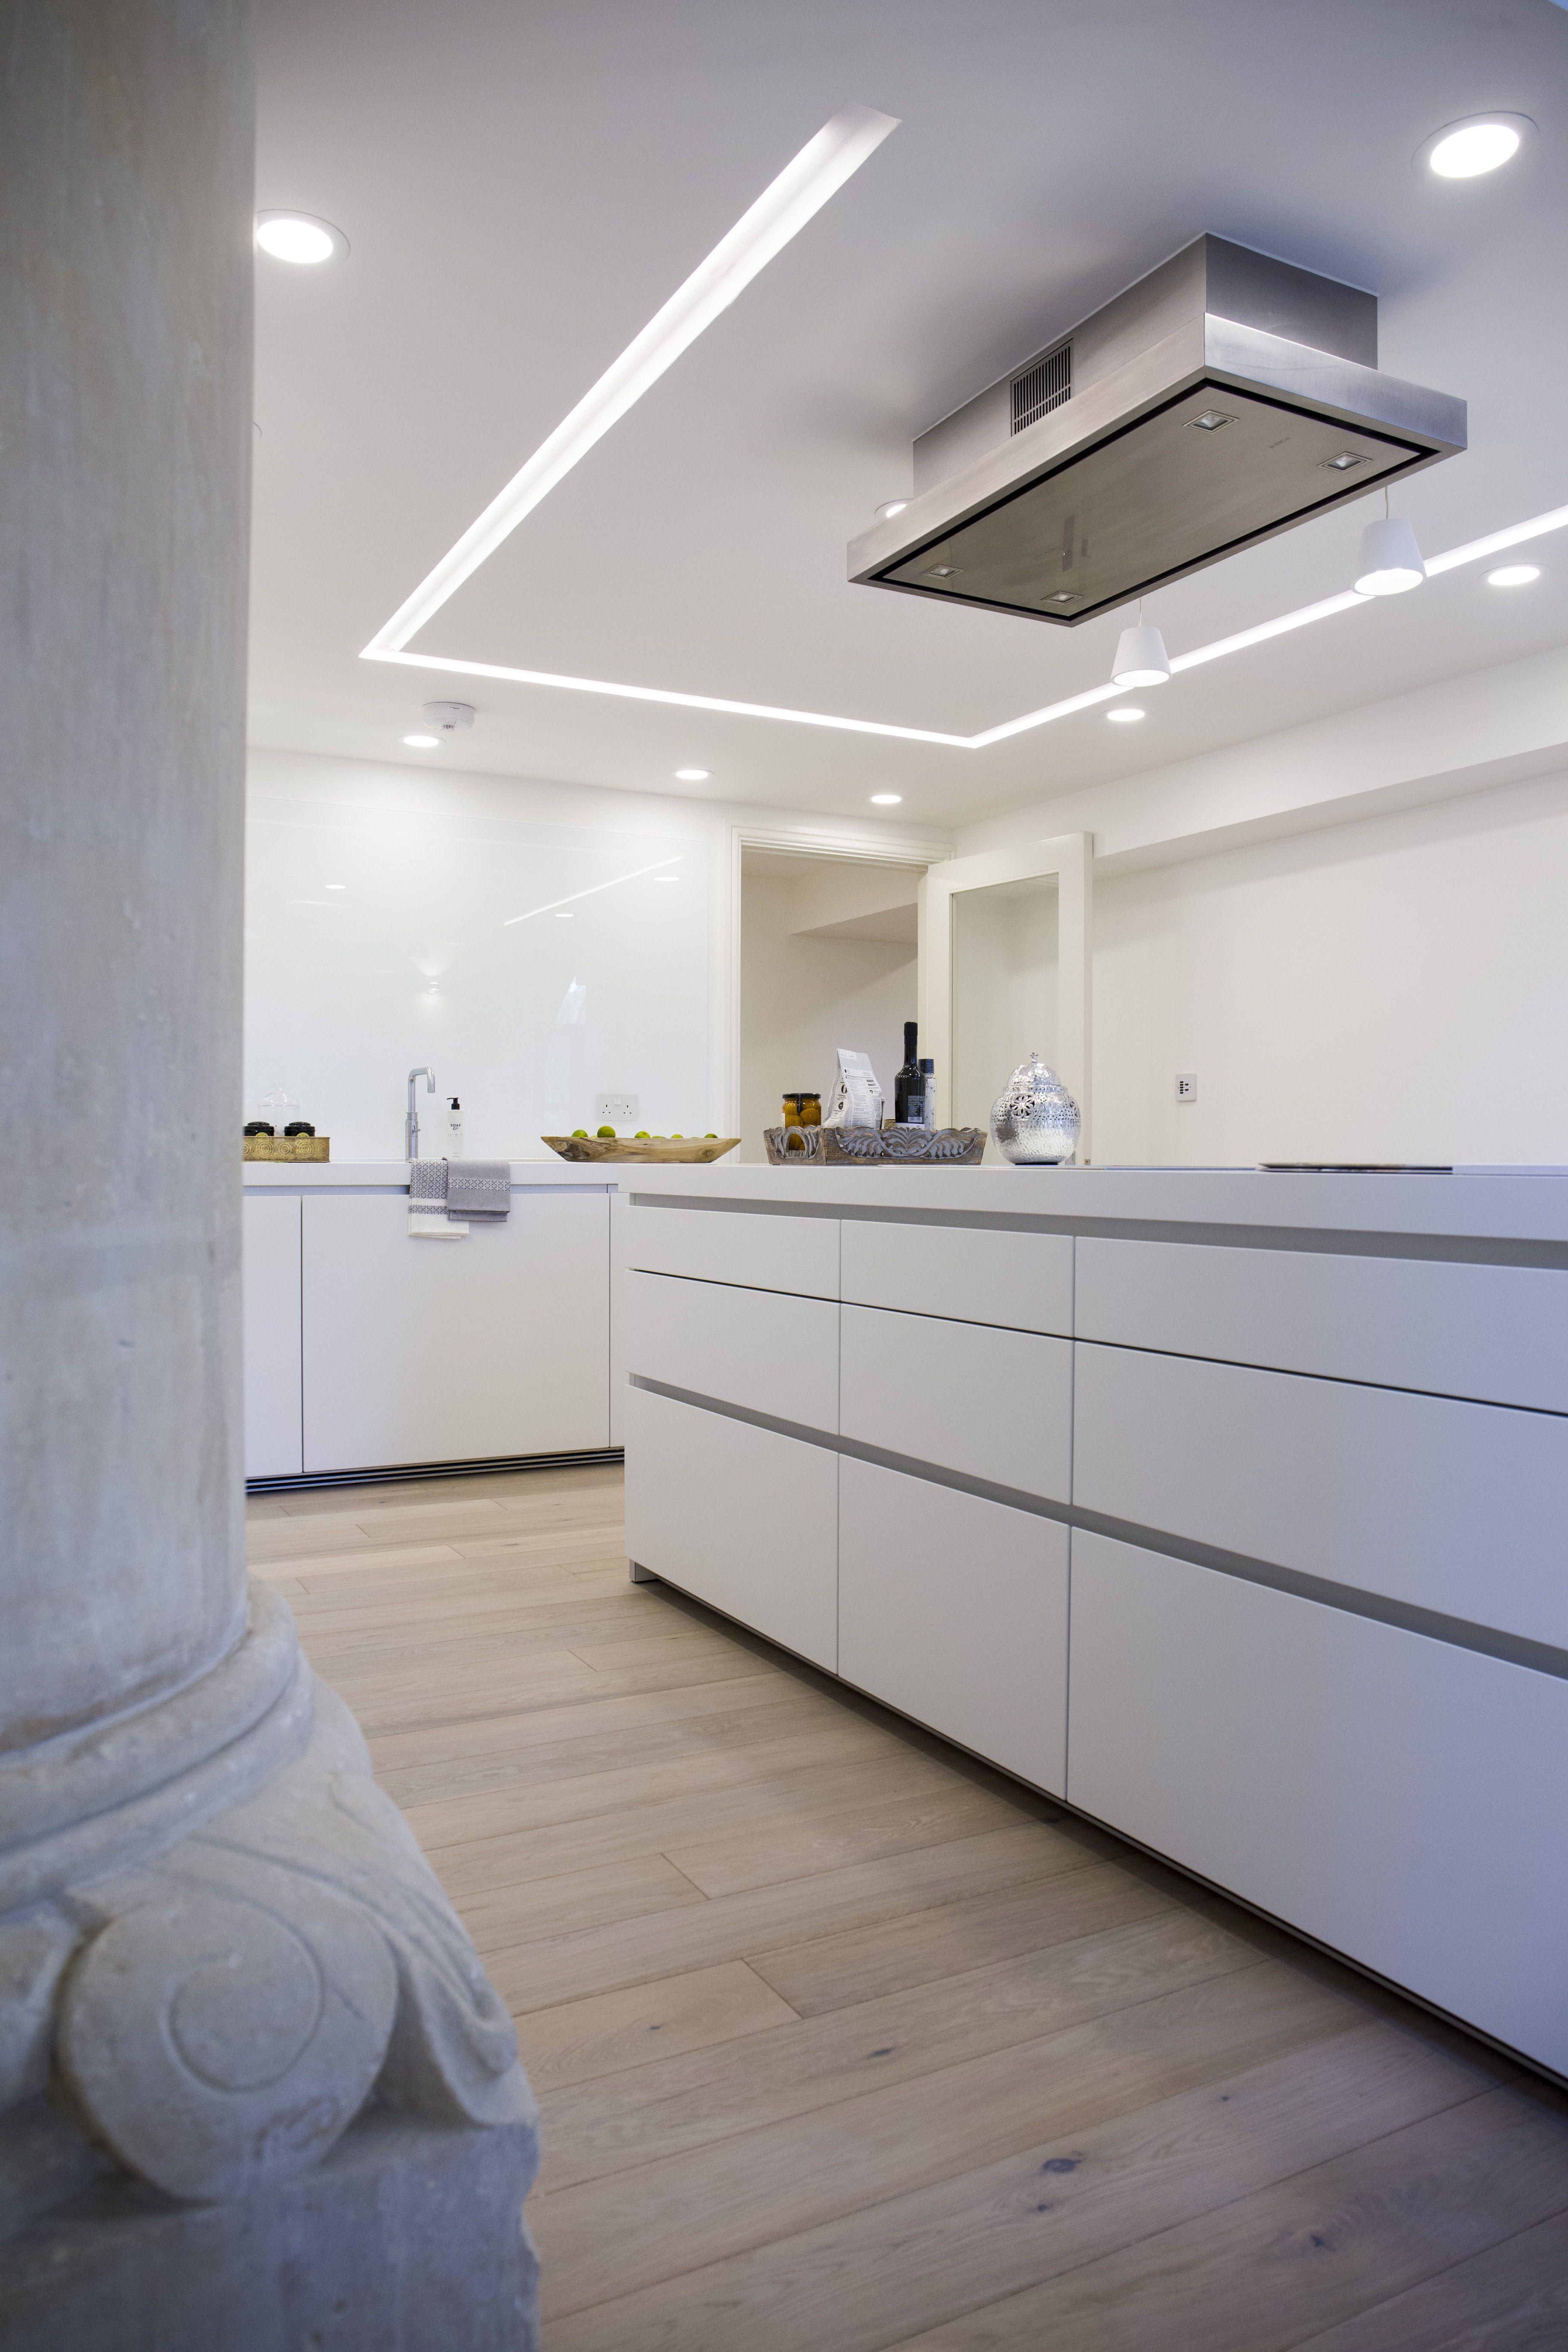 Bulthaup B1 Kitchen In Alpine White Matt Lacquer Miele And